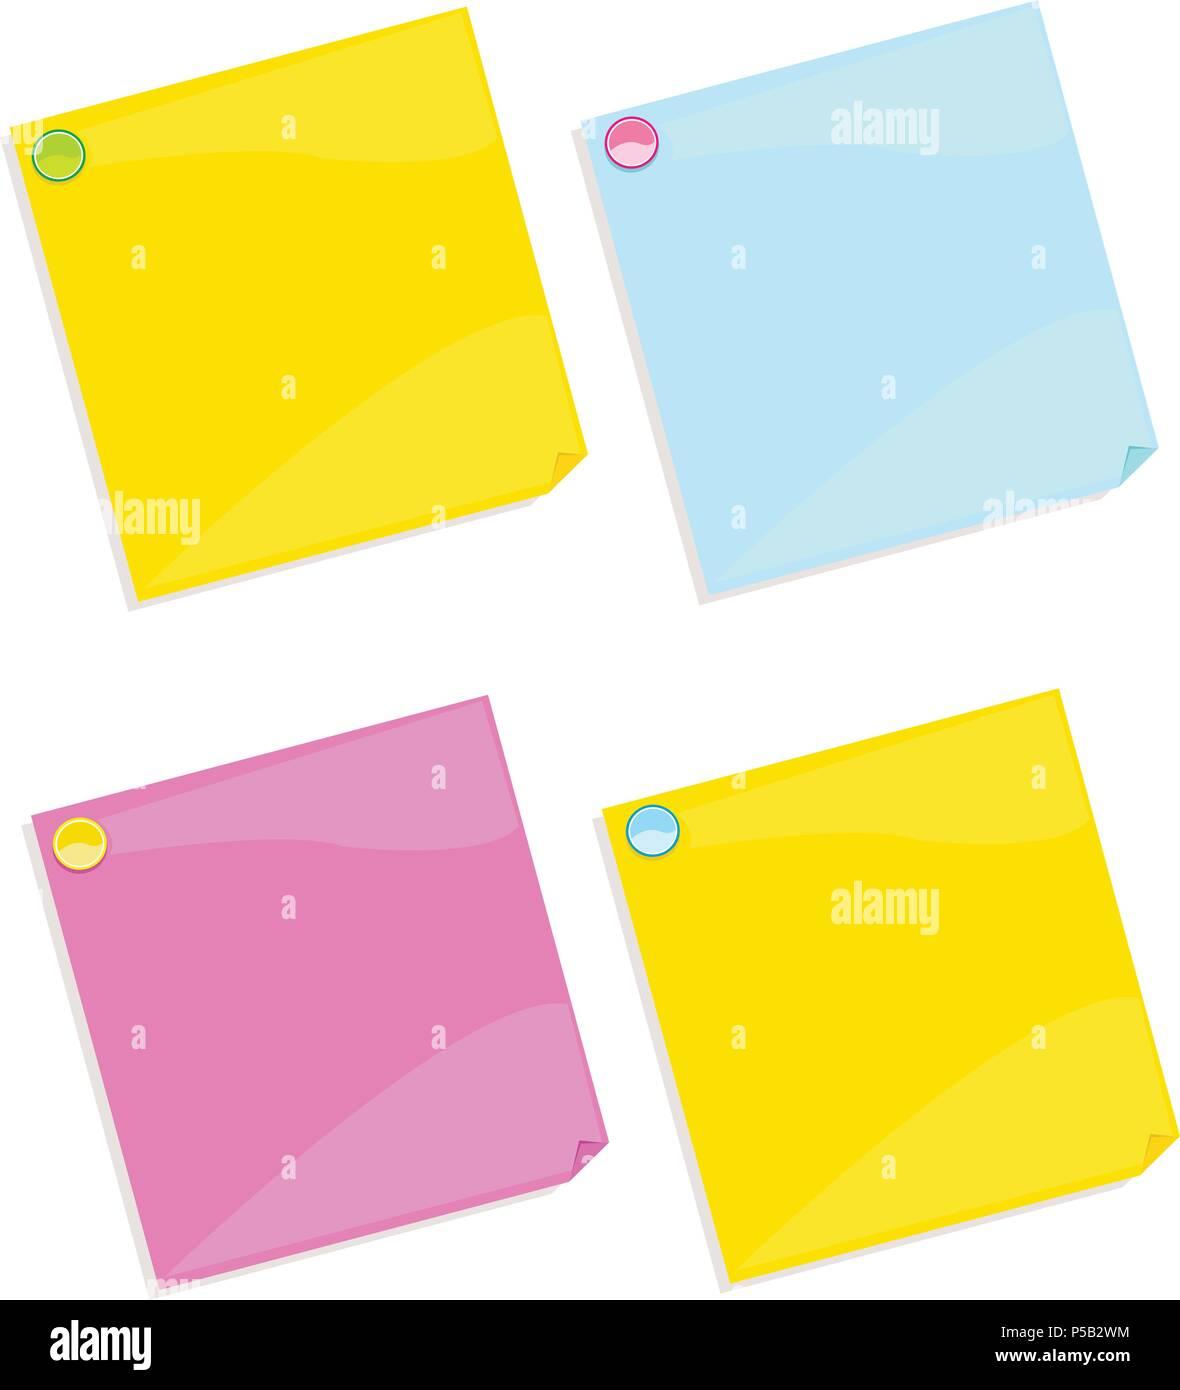 Colorful postit set - Stock Image